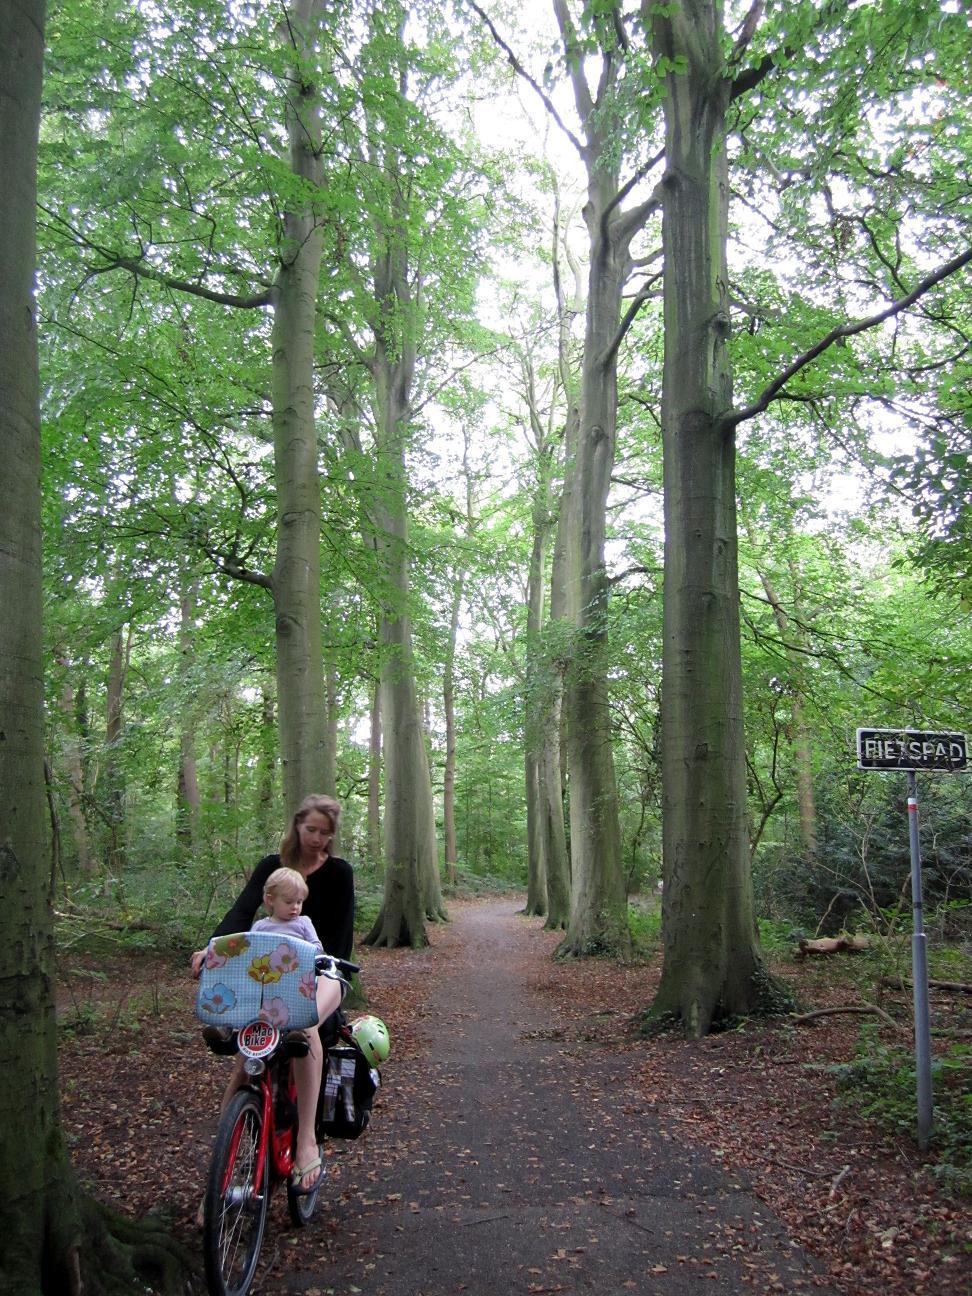 The Hague'sScheveningse Bosjes is a park providing a grand entrance to the Dunes.